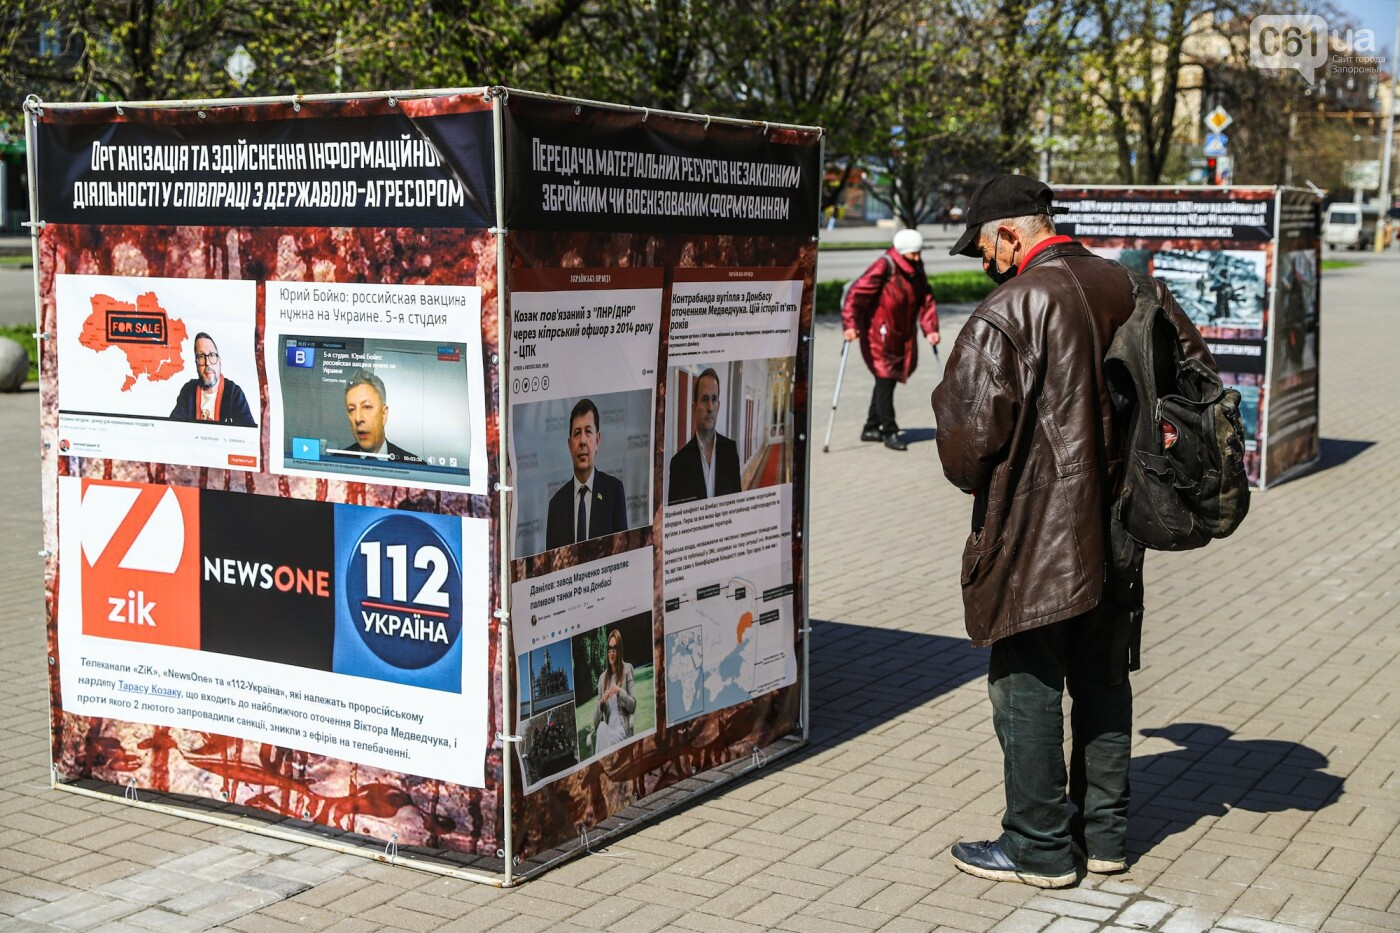 В Запорожье возле мэрии установили стенды с портретами Медведчука и Шария, - ФОТО, фото-9